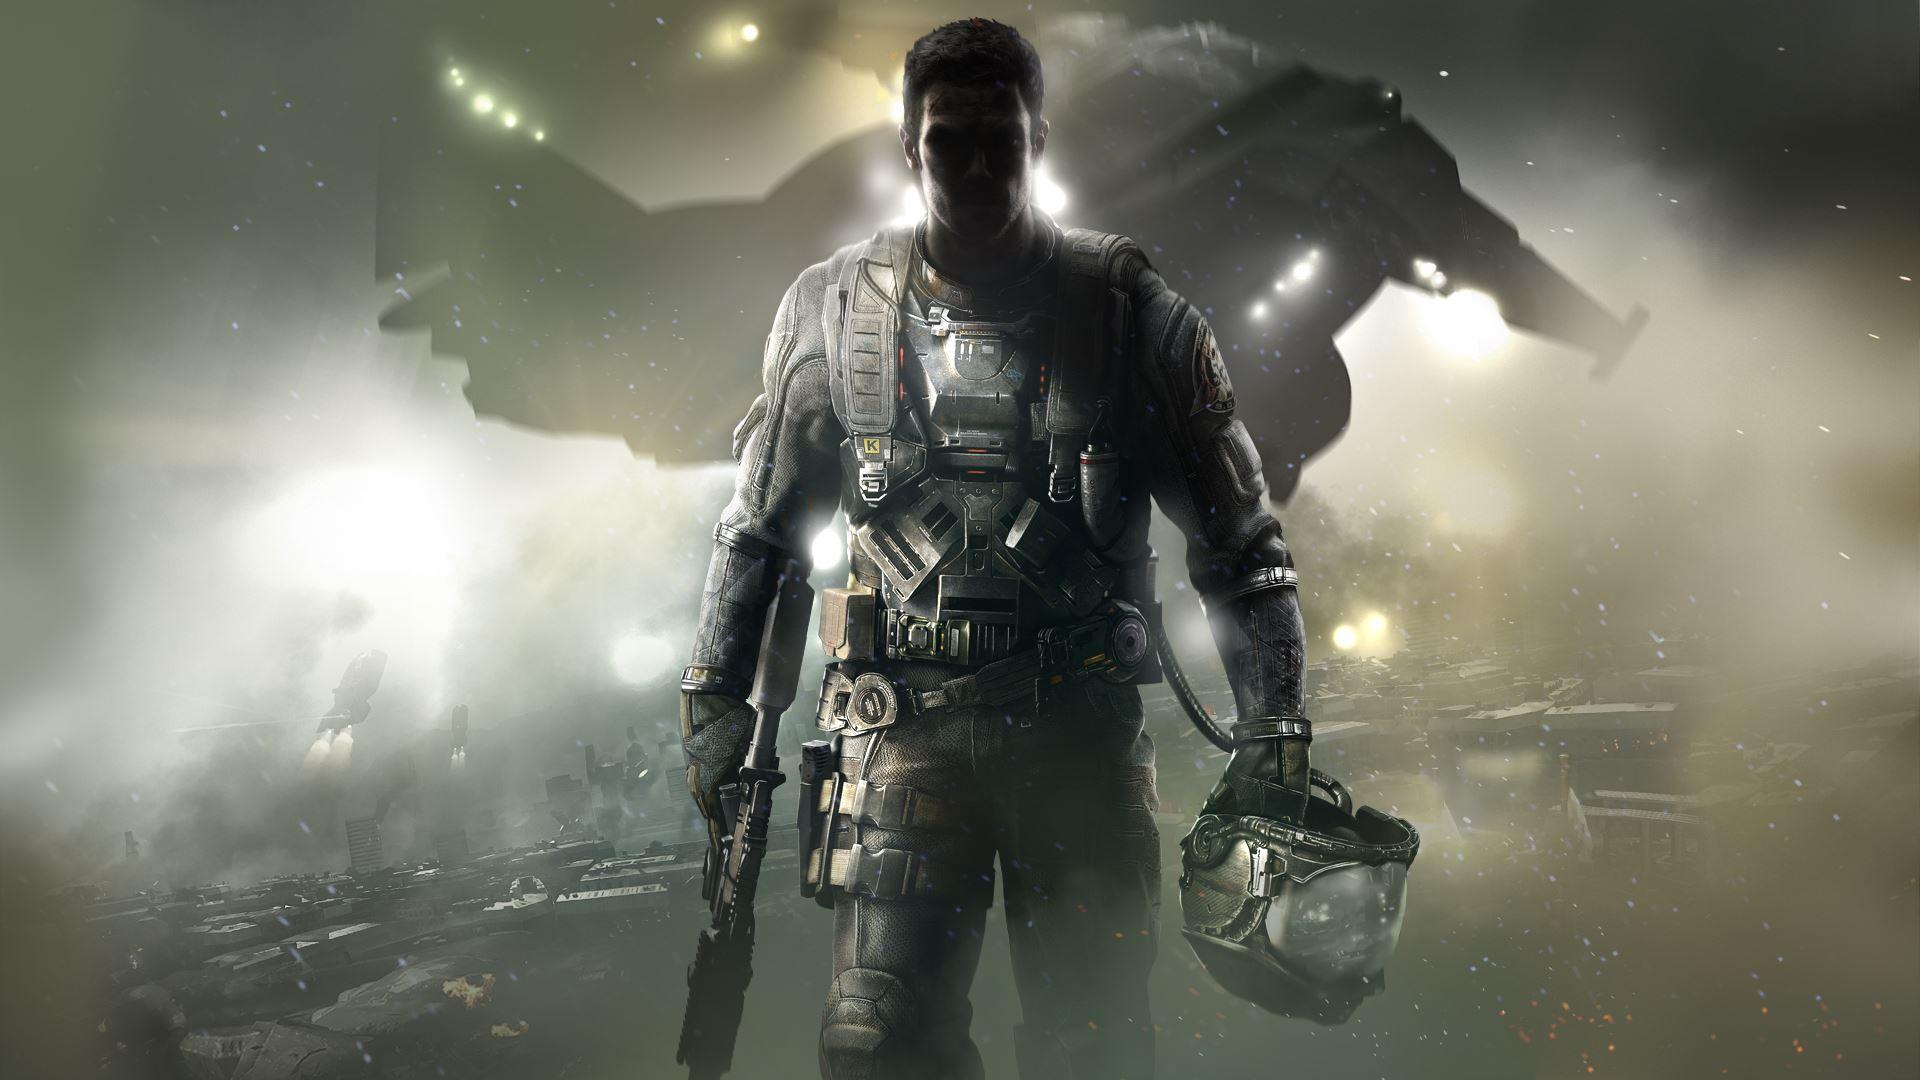 Review: Call of Duty: Infinite Warfare